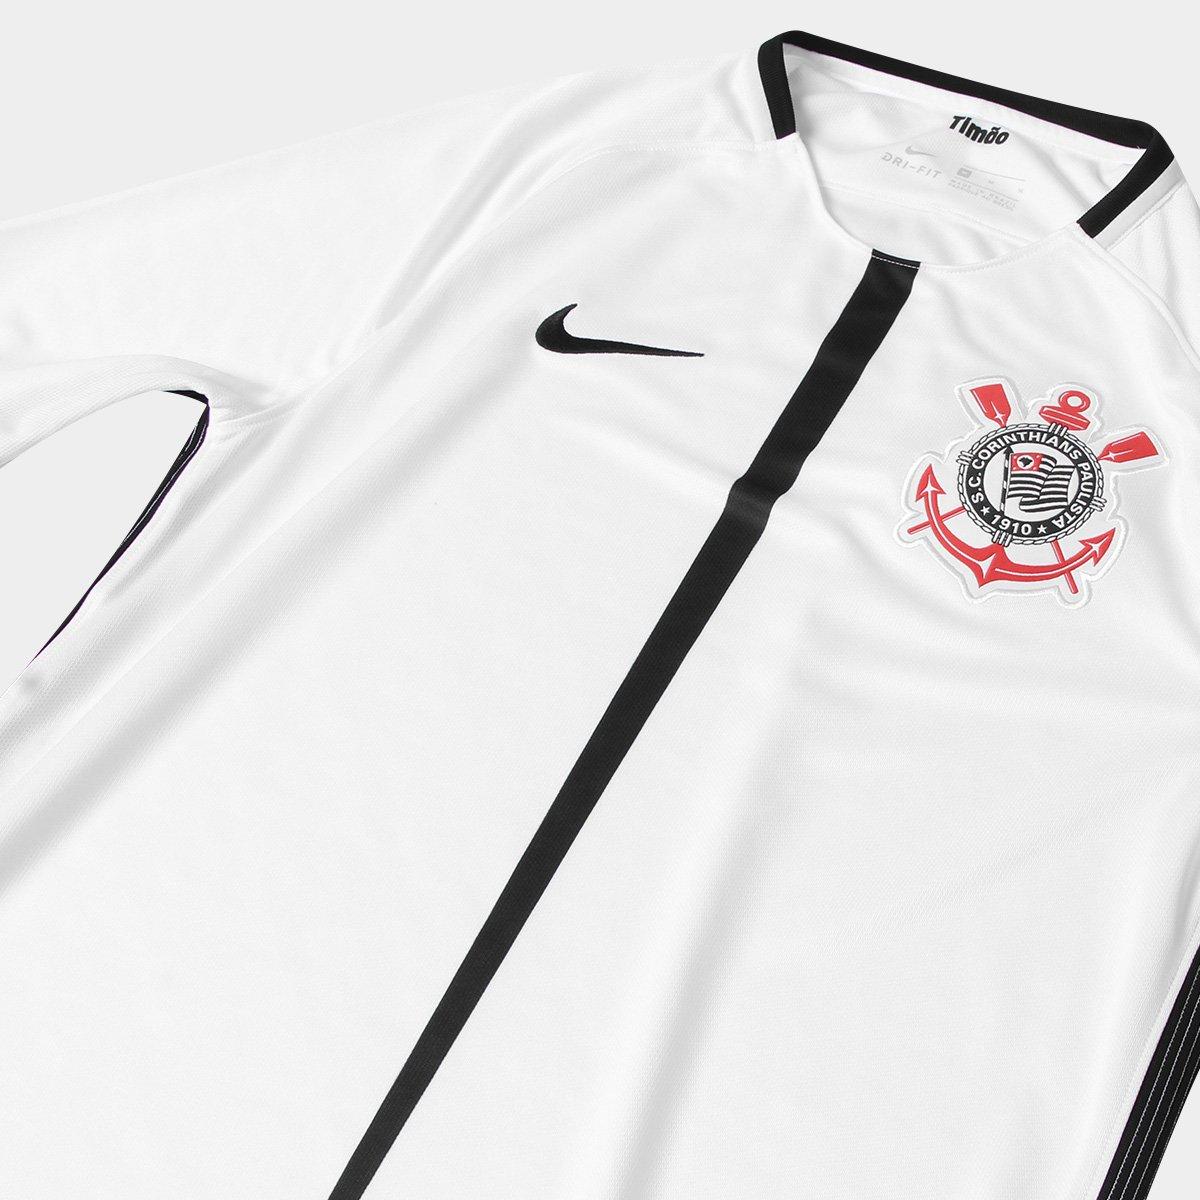 21370190fe Camisa Corinthians I 17 18 s nº Torcedor Nike Masculina - Compre ...